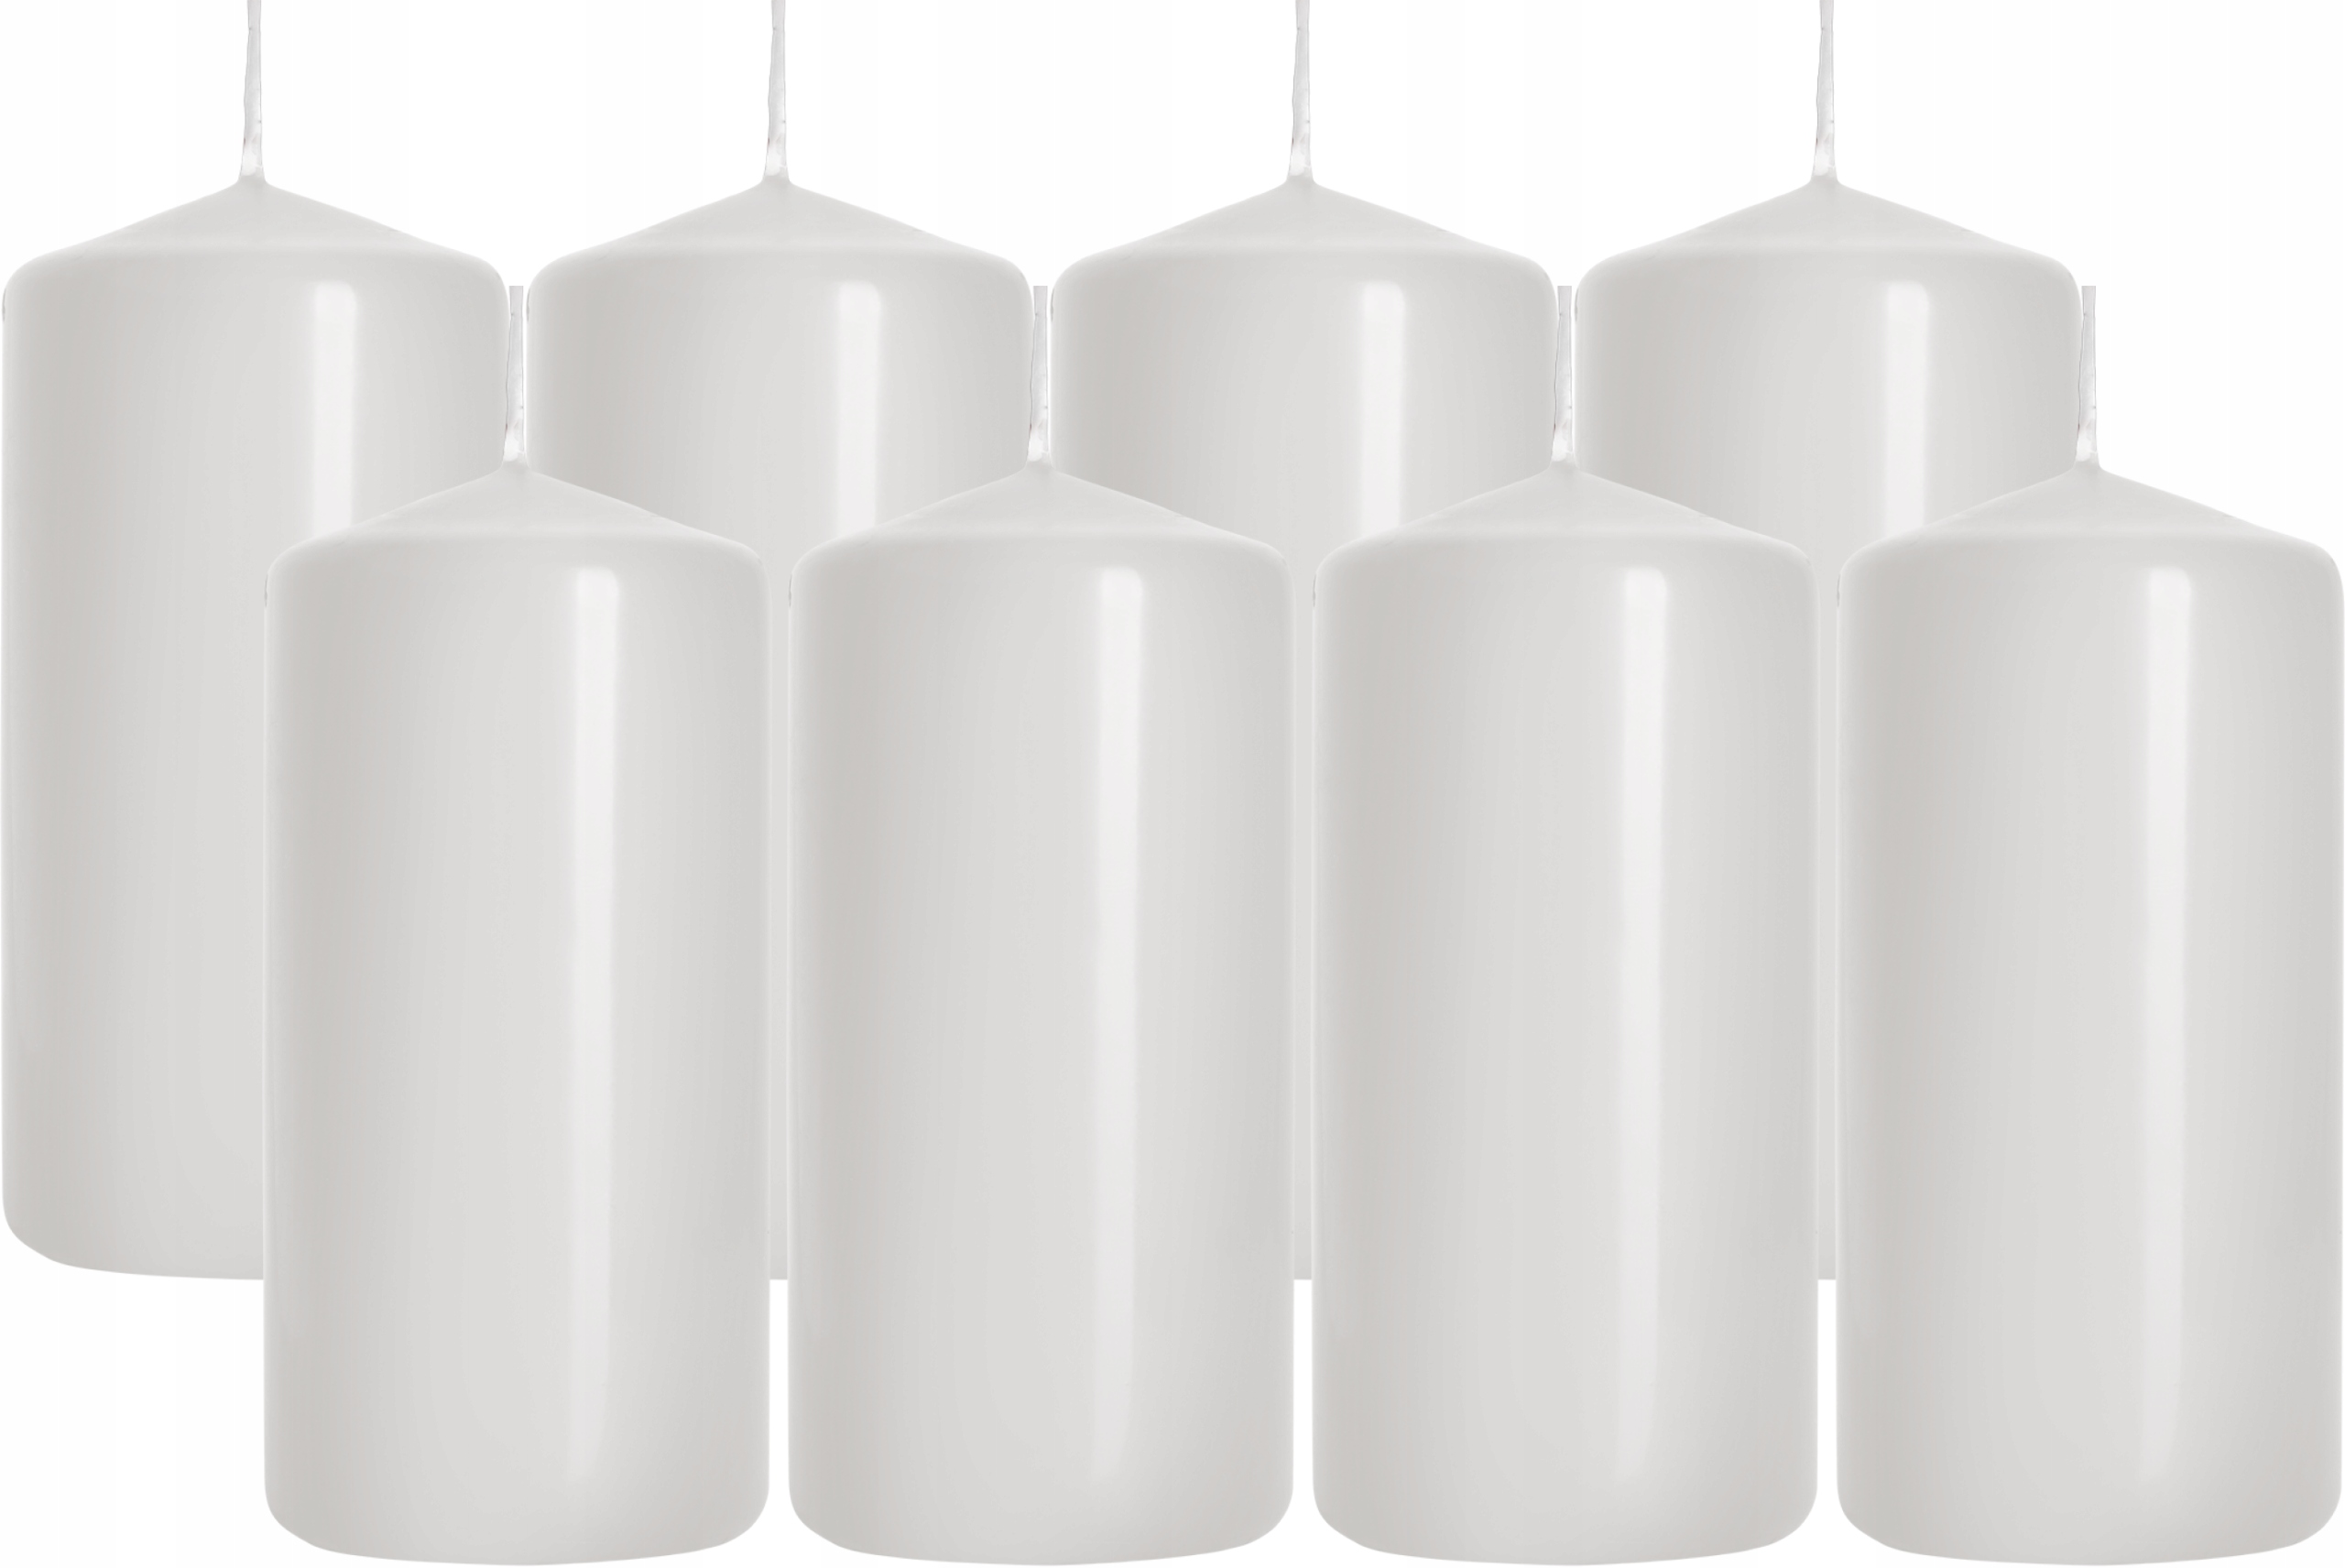 8x Bispol свечи ролики 20h / 10cm / белый